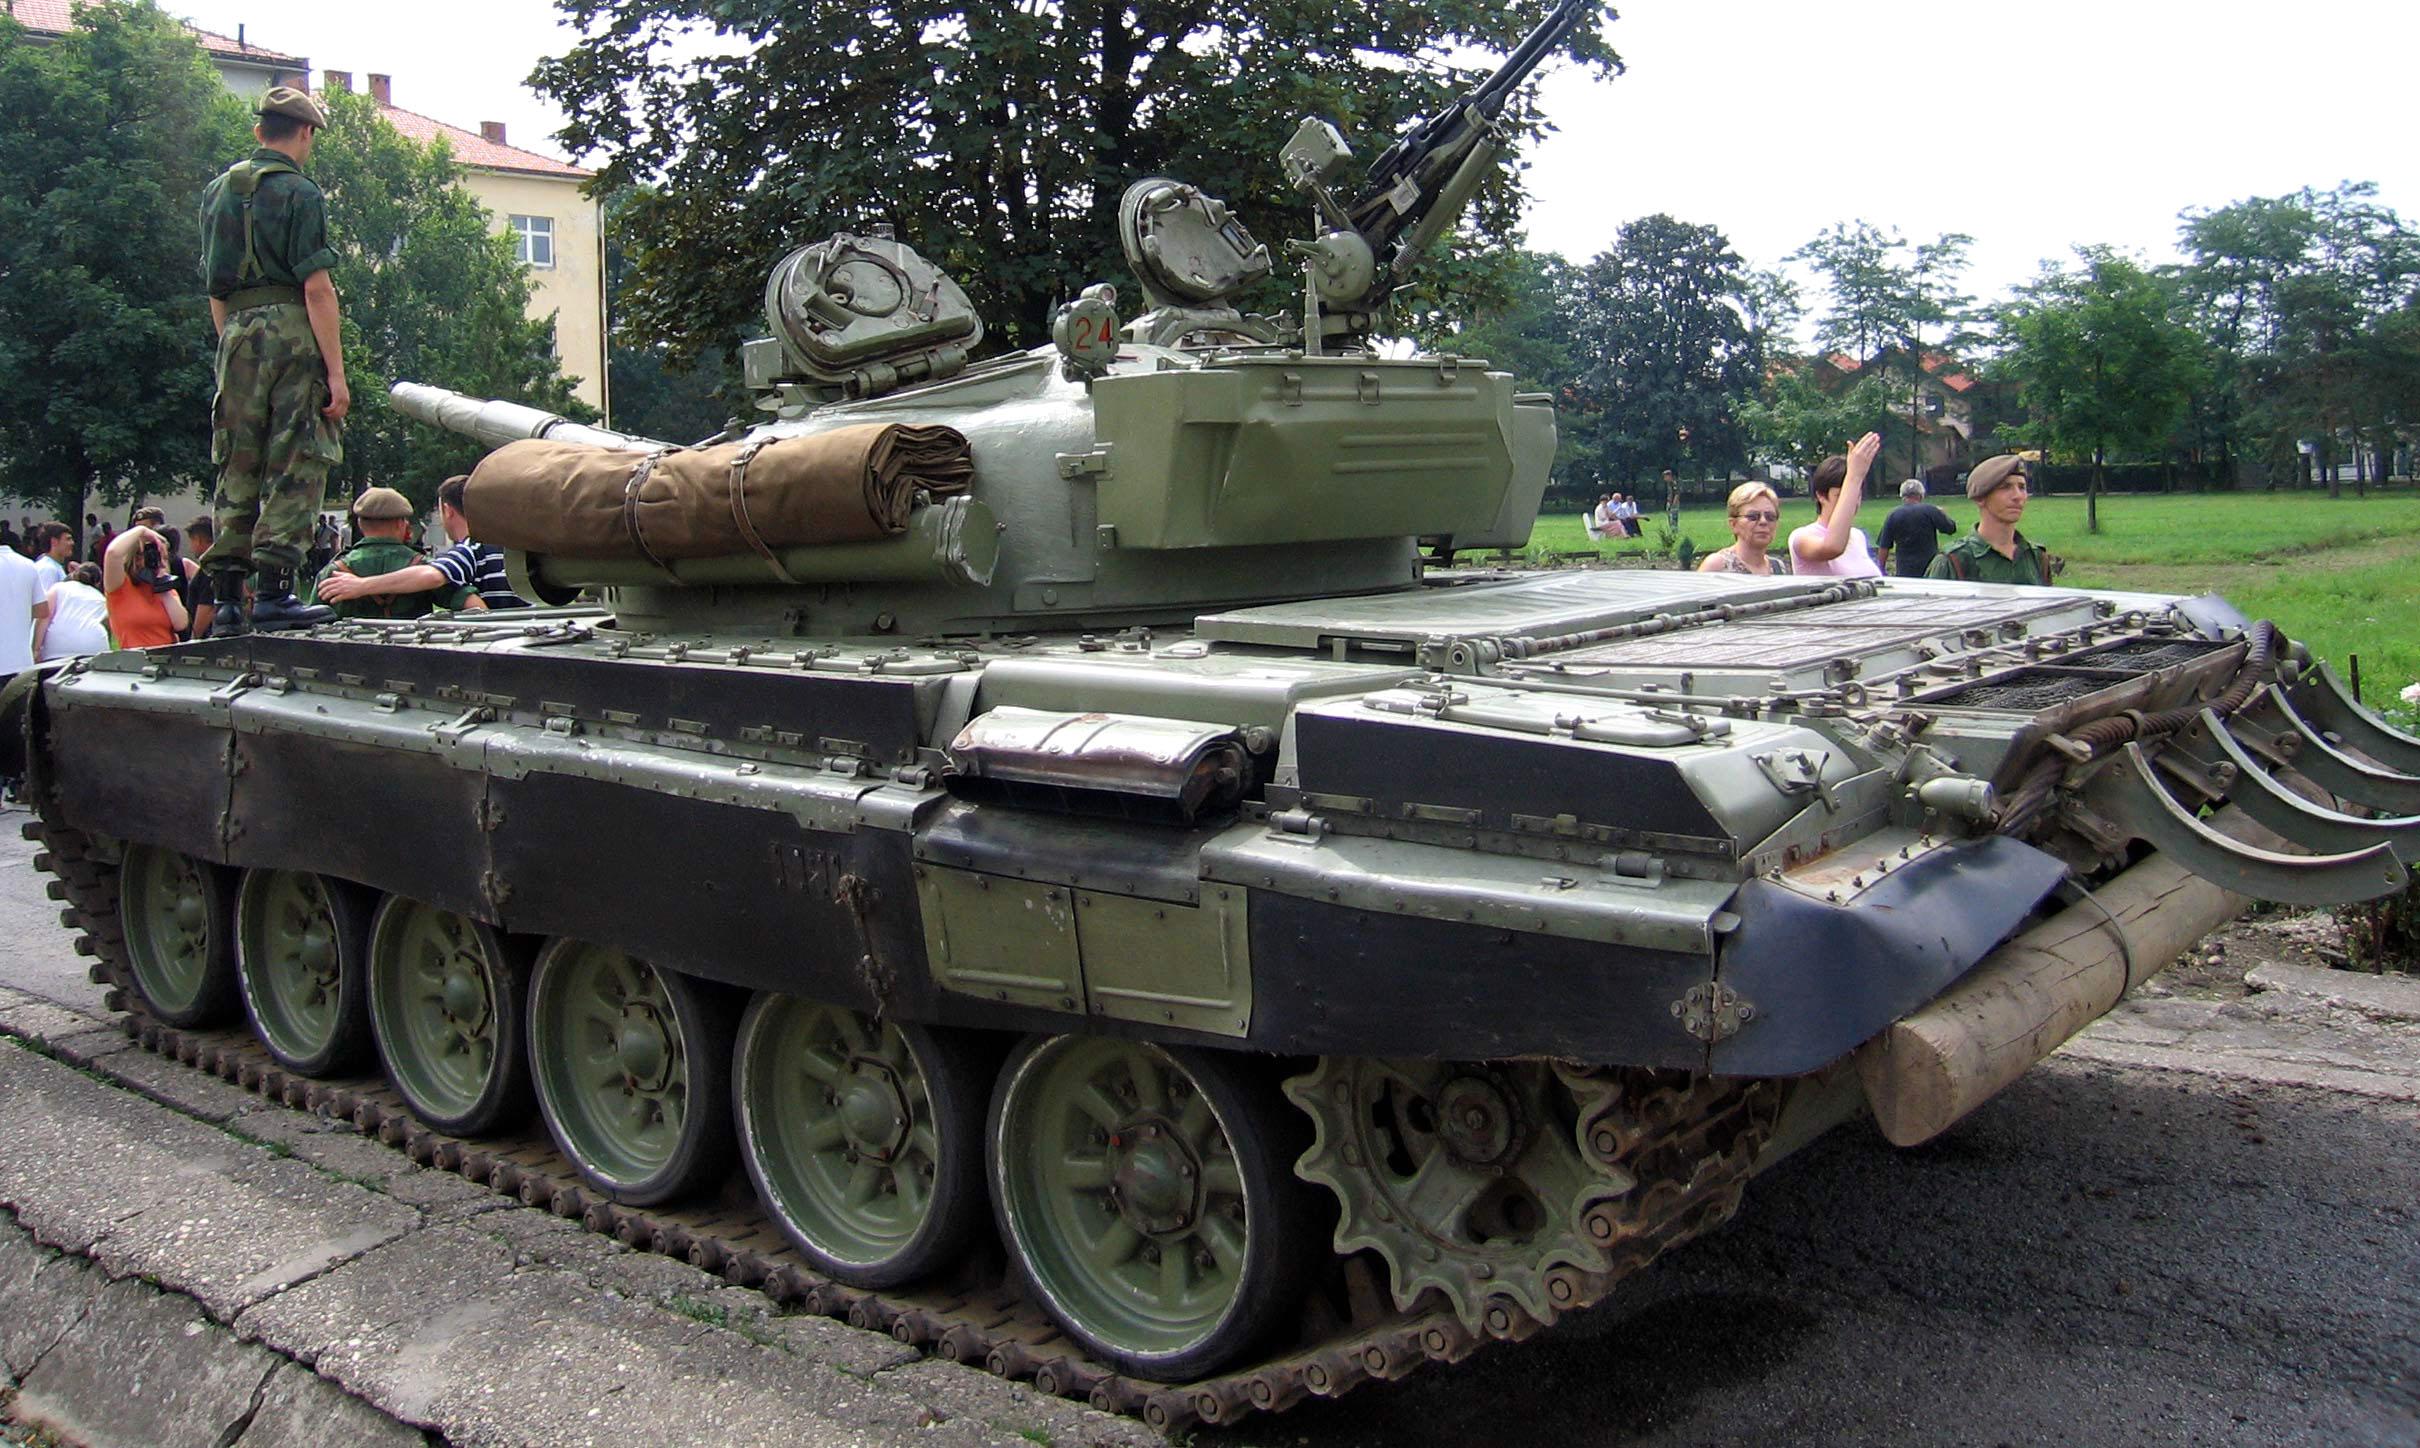 File:Yu MBT M-84 02.jpg - Wikimedia Commons